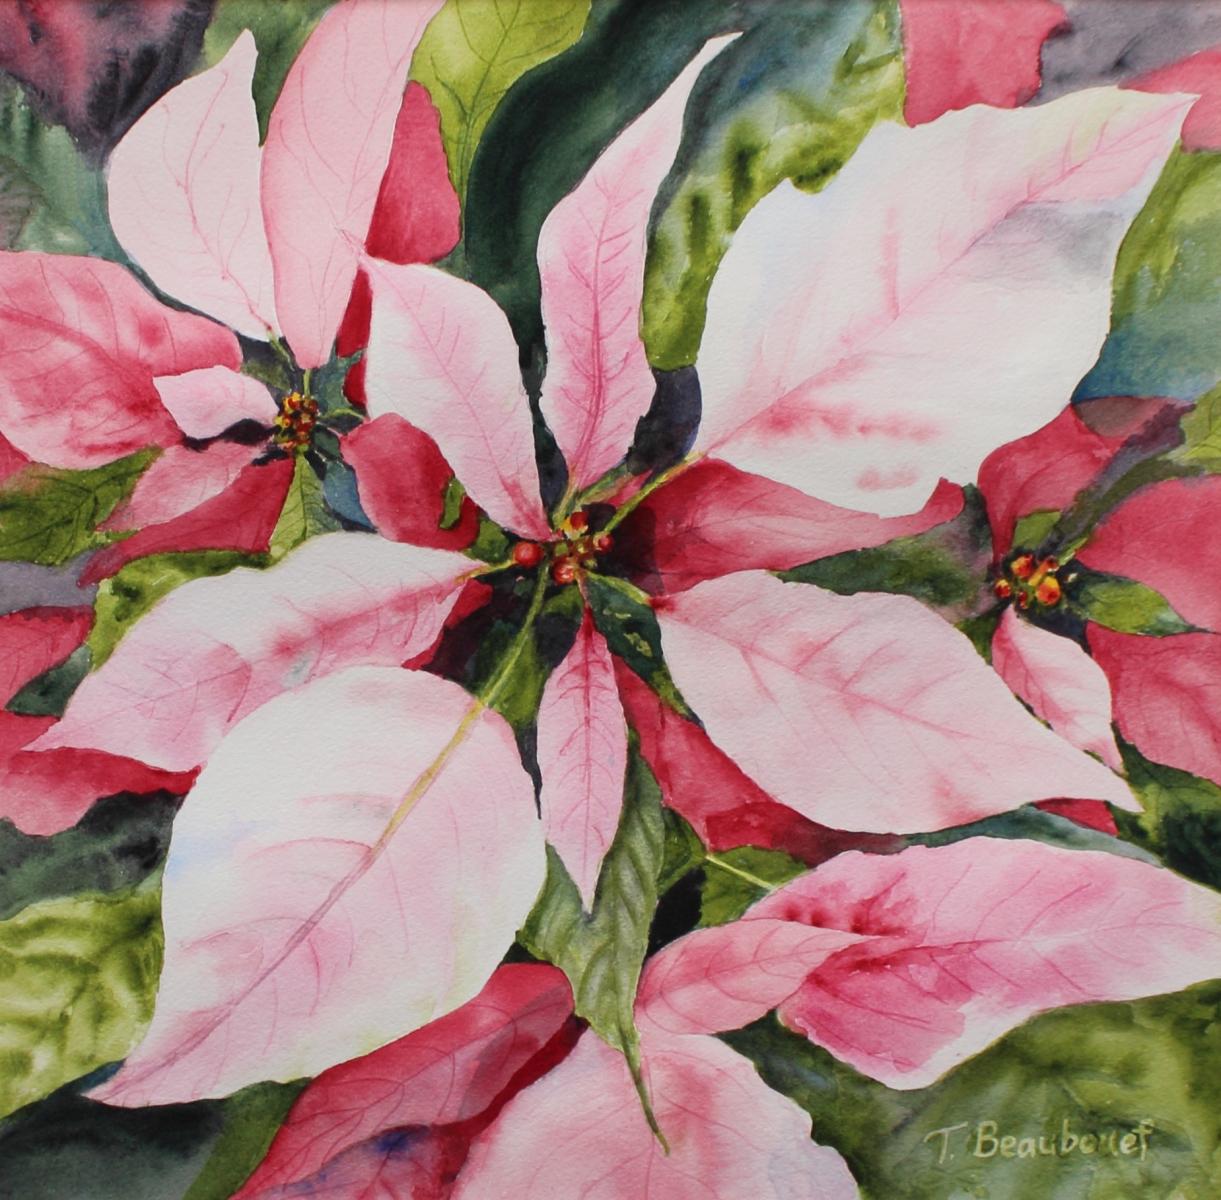 Beaubouef-Theresa-Pink-Poinsettias-14x14